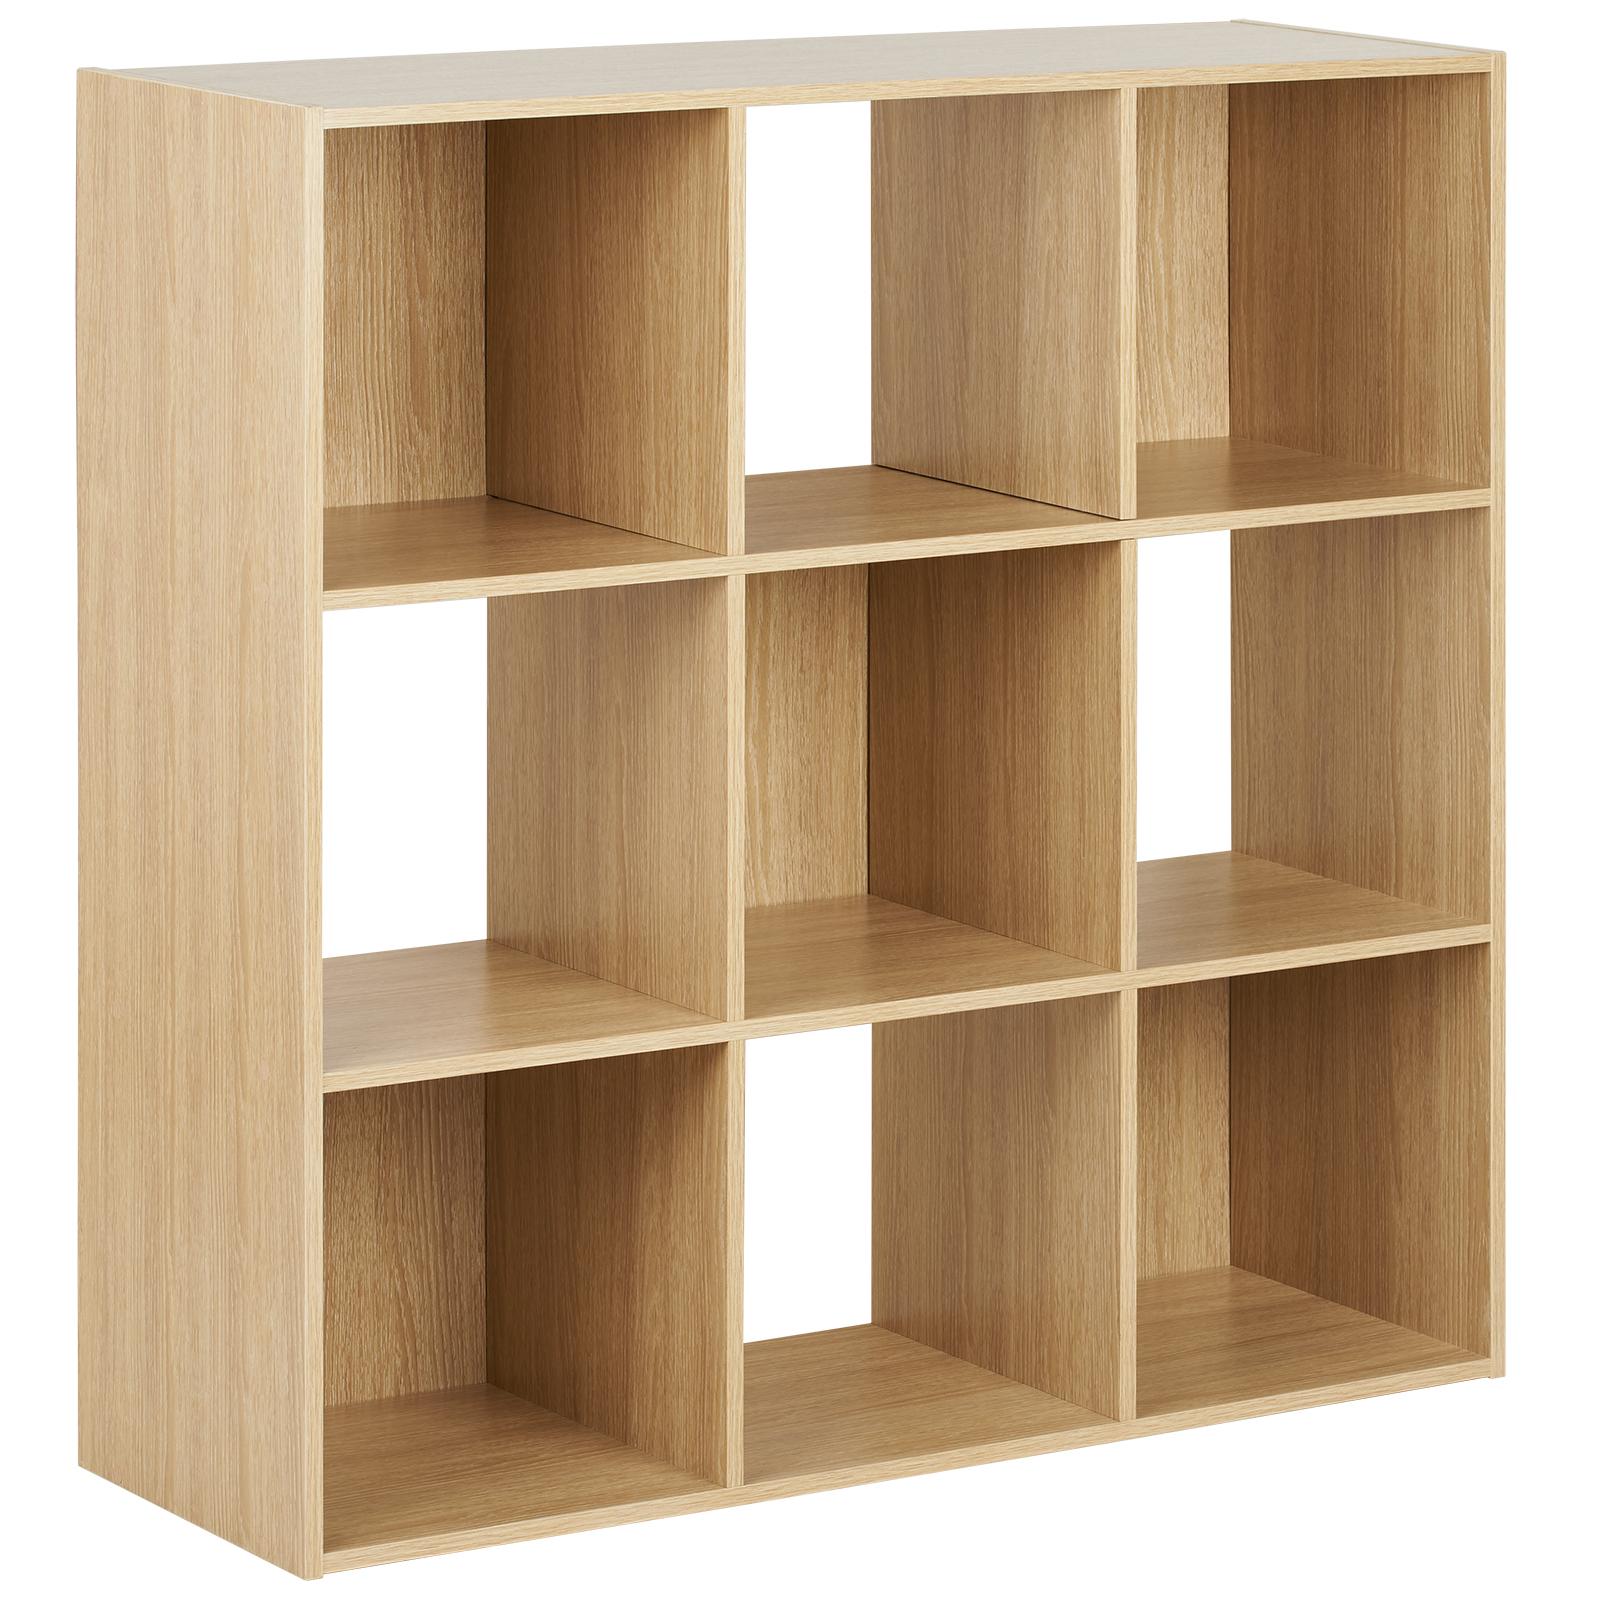 Hartleys Wood 9 Cube Modular Square Storage/Shelving 3 Tier Shelf ...